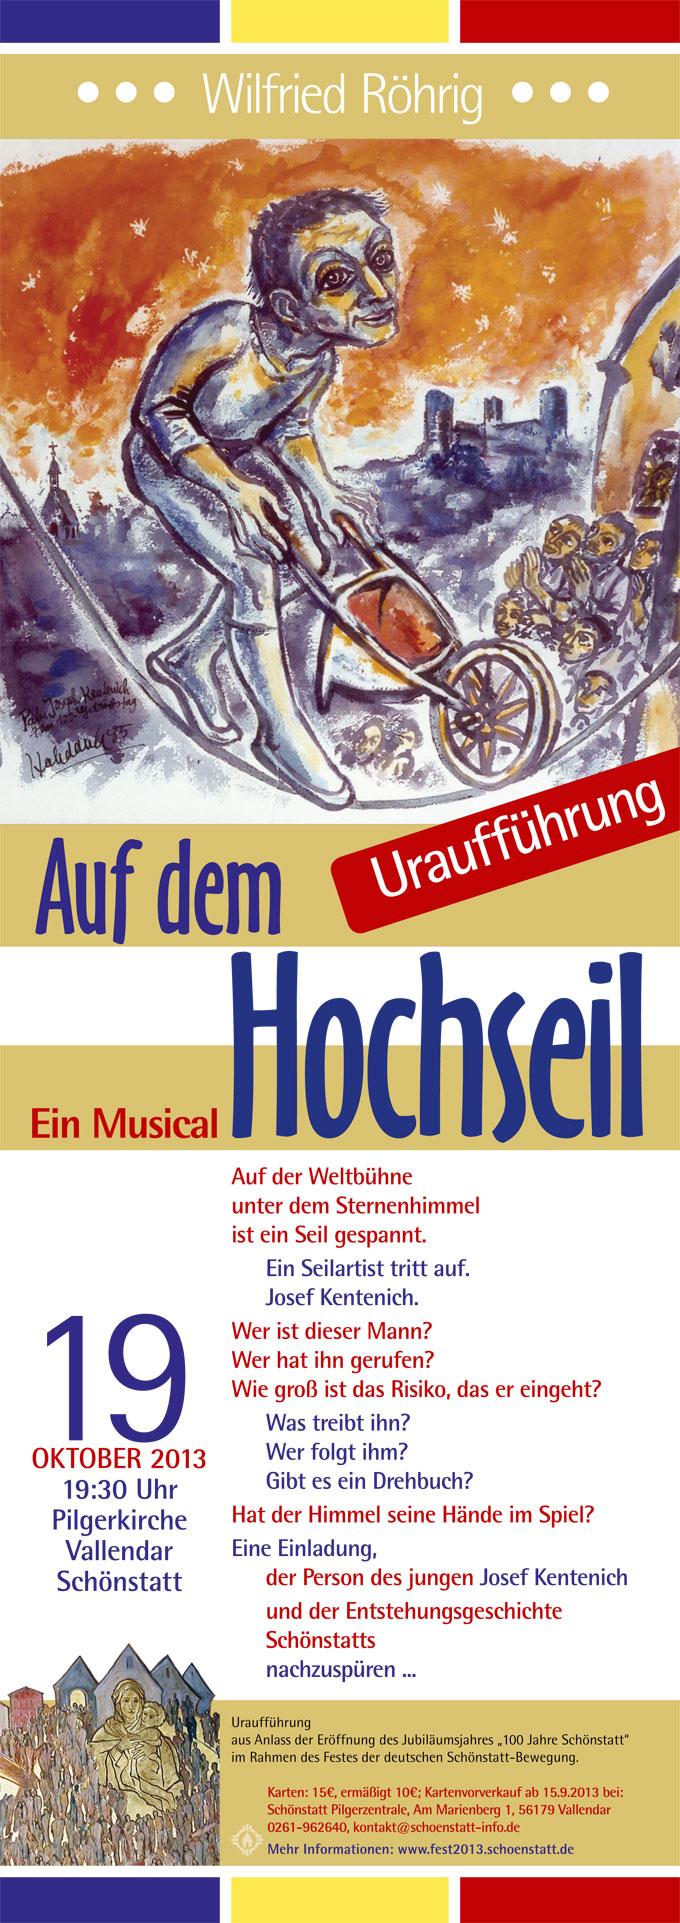 Musical Einladungs-Plakat (Gestaltung: Brehm)